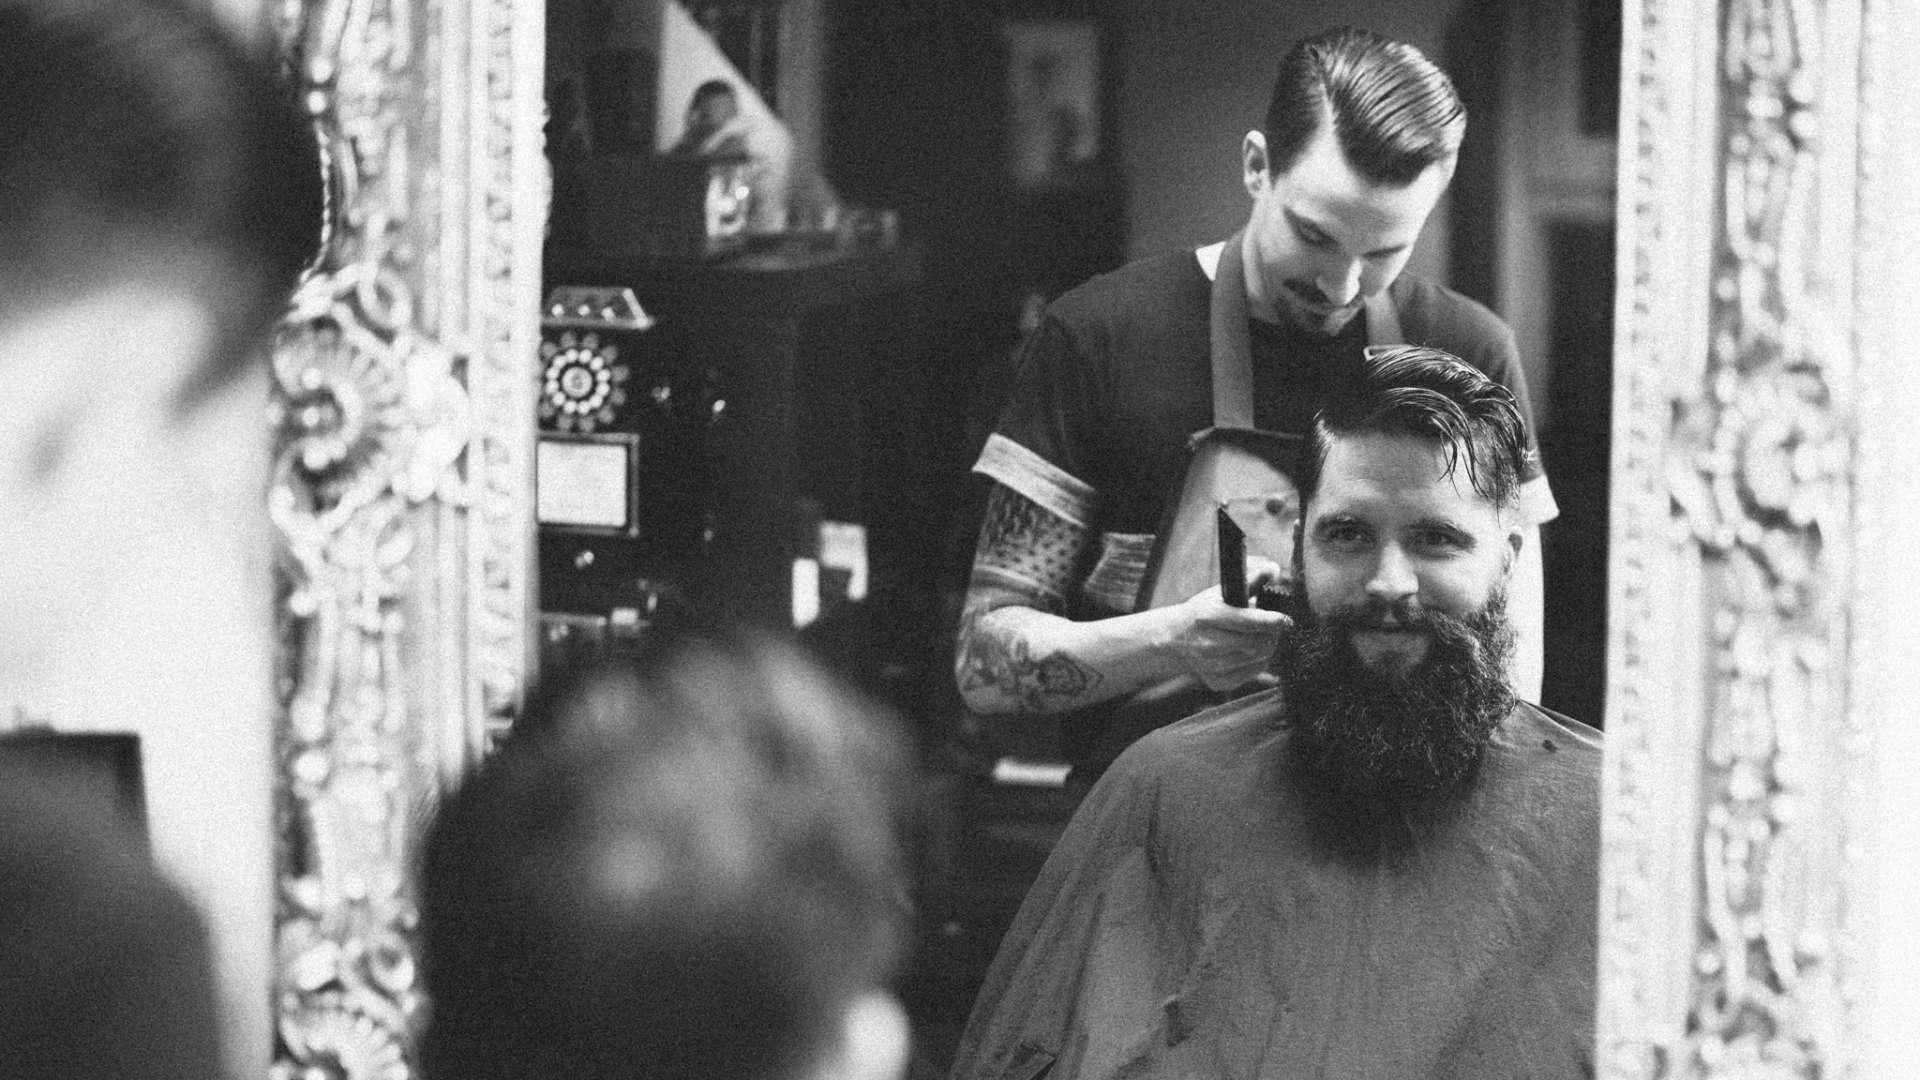 Blackbeards Bartpflege